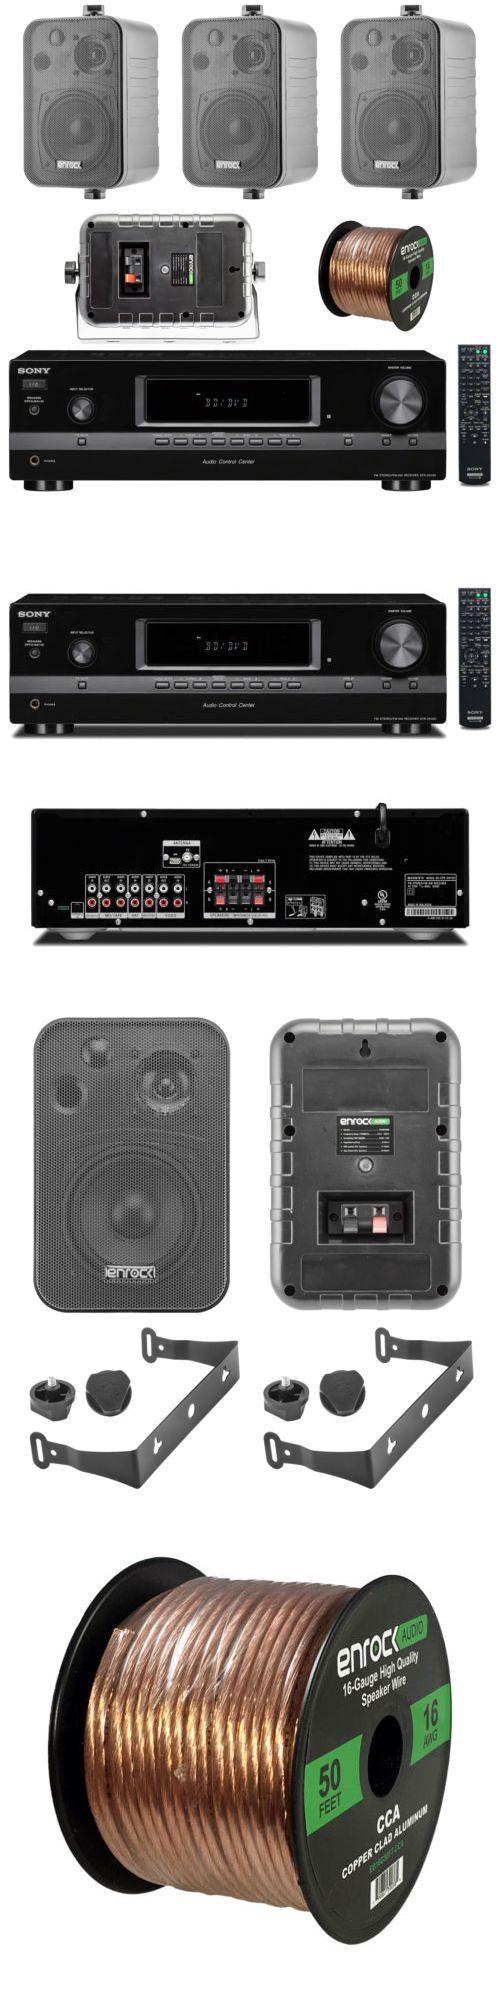 Accessory Bundles: Sony Am Fm Stereo Receiver, Enrock 4 In Outdoor Speakers, 50Ft Speaker Wire -> BUY IT NOW ONLY: $228.99 on eBay!